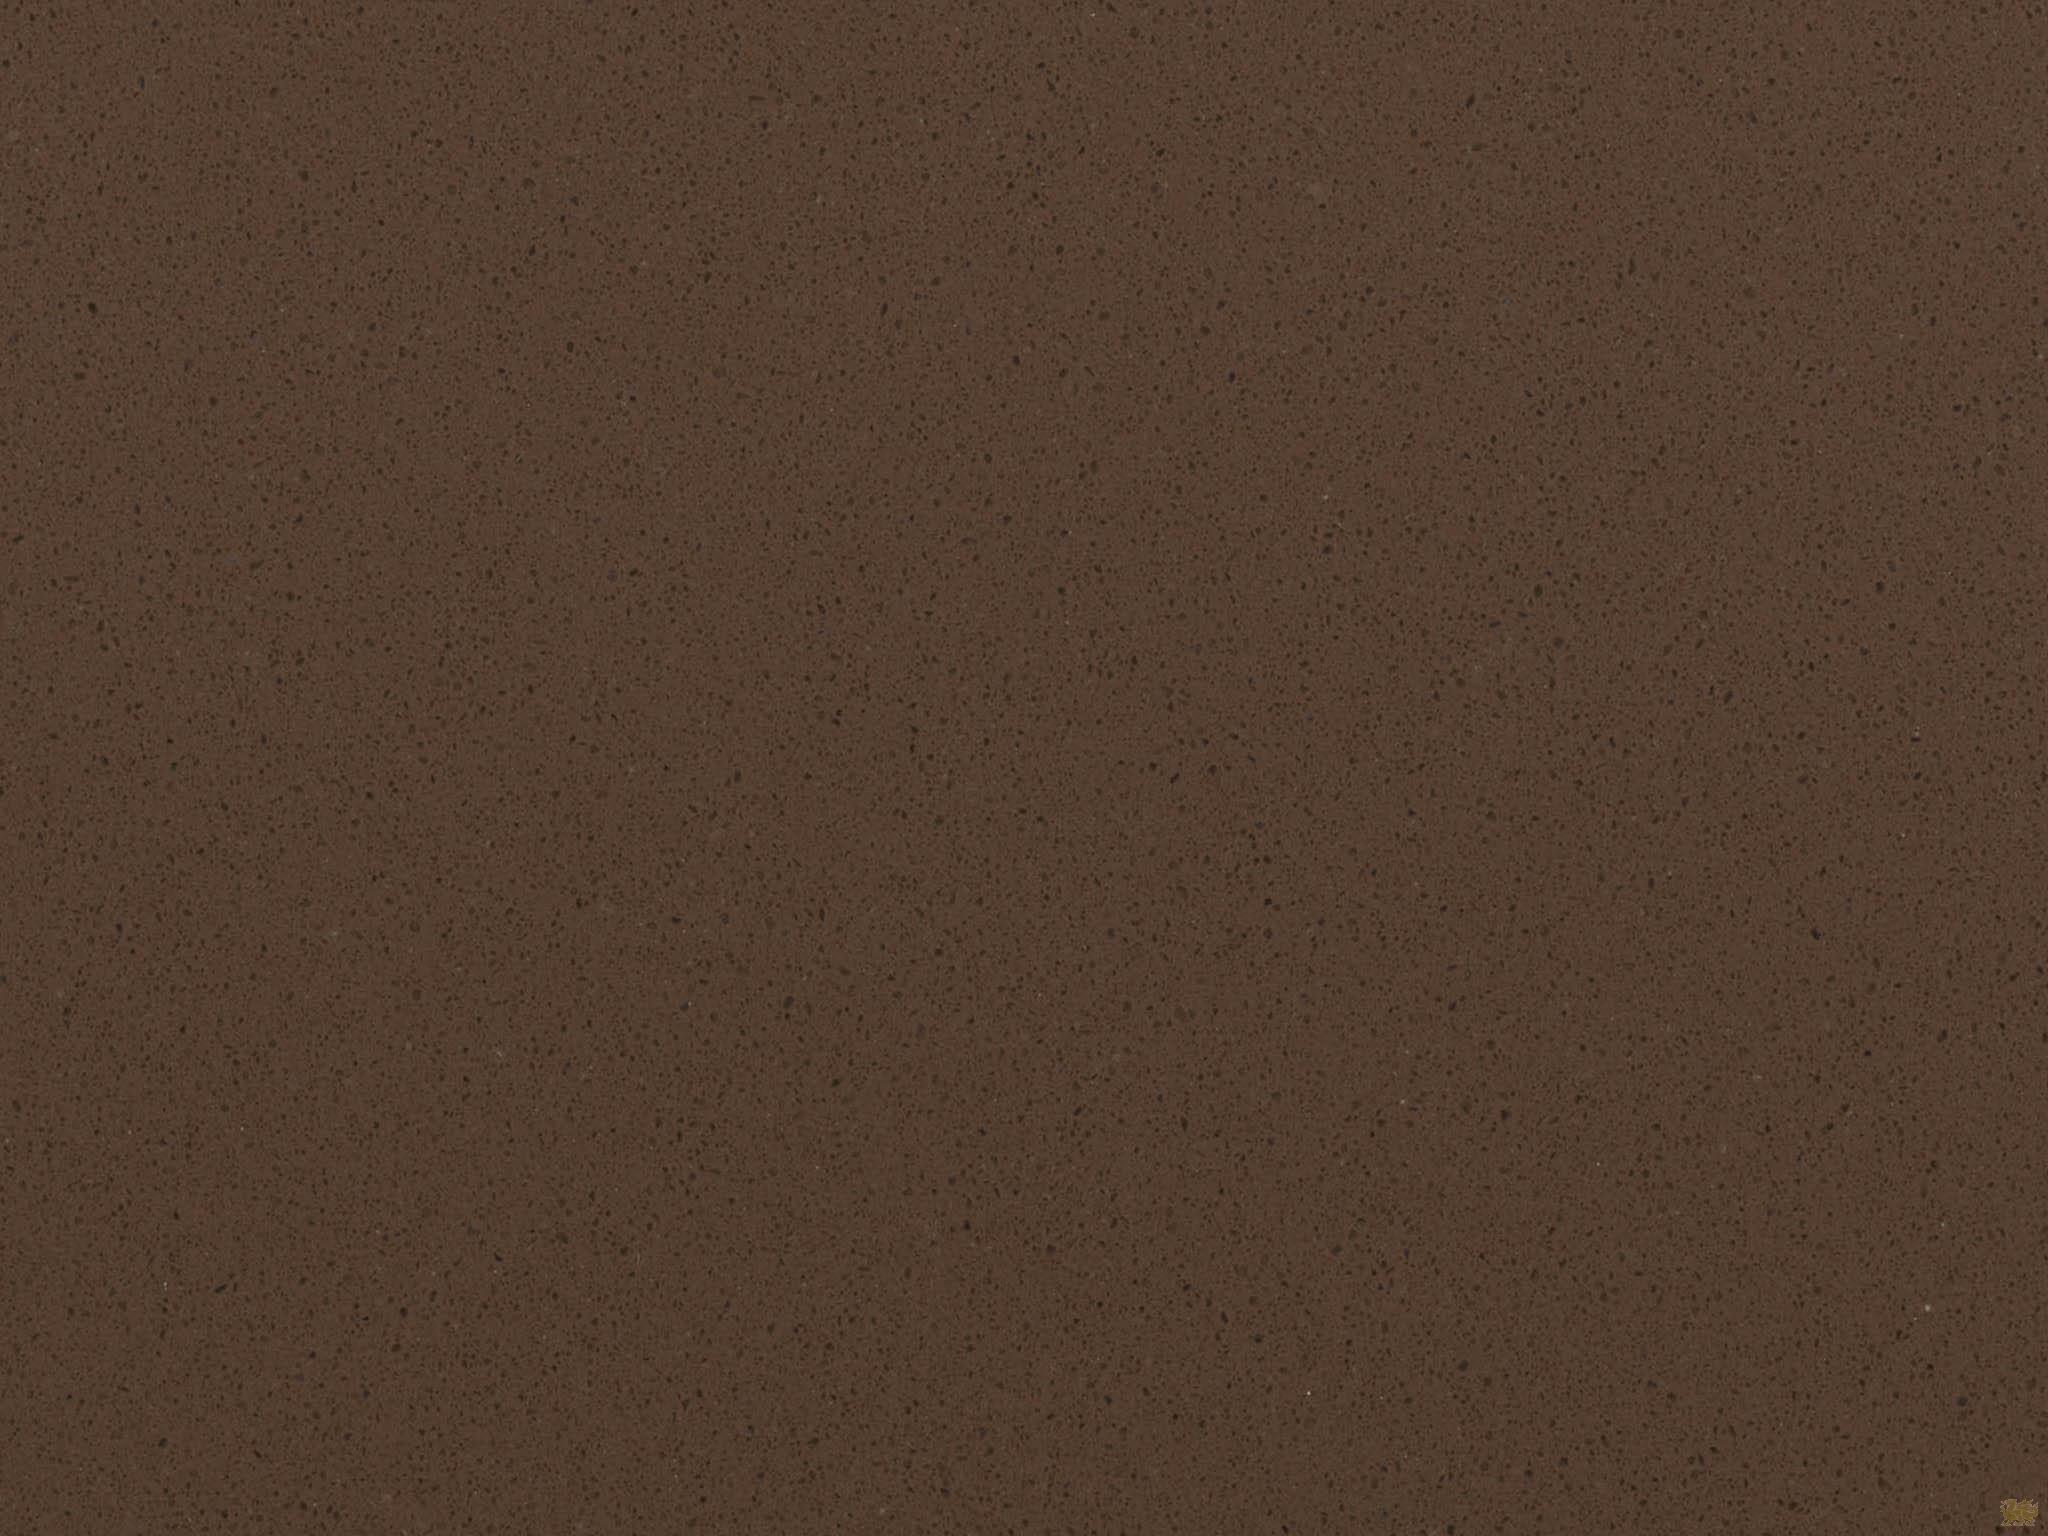 Polimer Decor Adli Kullanicinin Cambria Tezgah Cambria Renk Kartelasi Cambria Modelleri Cambria Gorselleri Cambria Kuvars Panosundaki Pin Goruntuler Ile Renkler Urunler